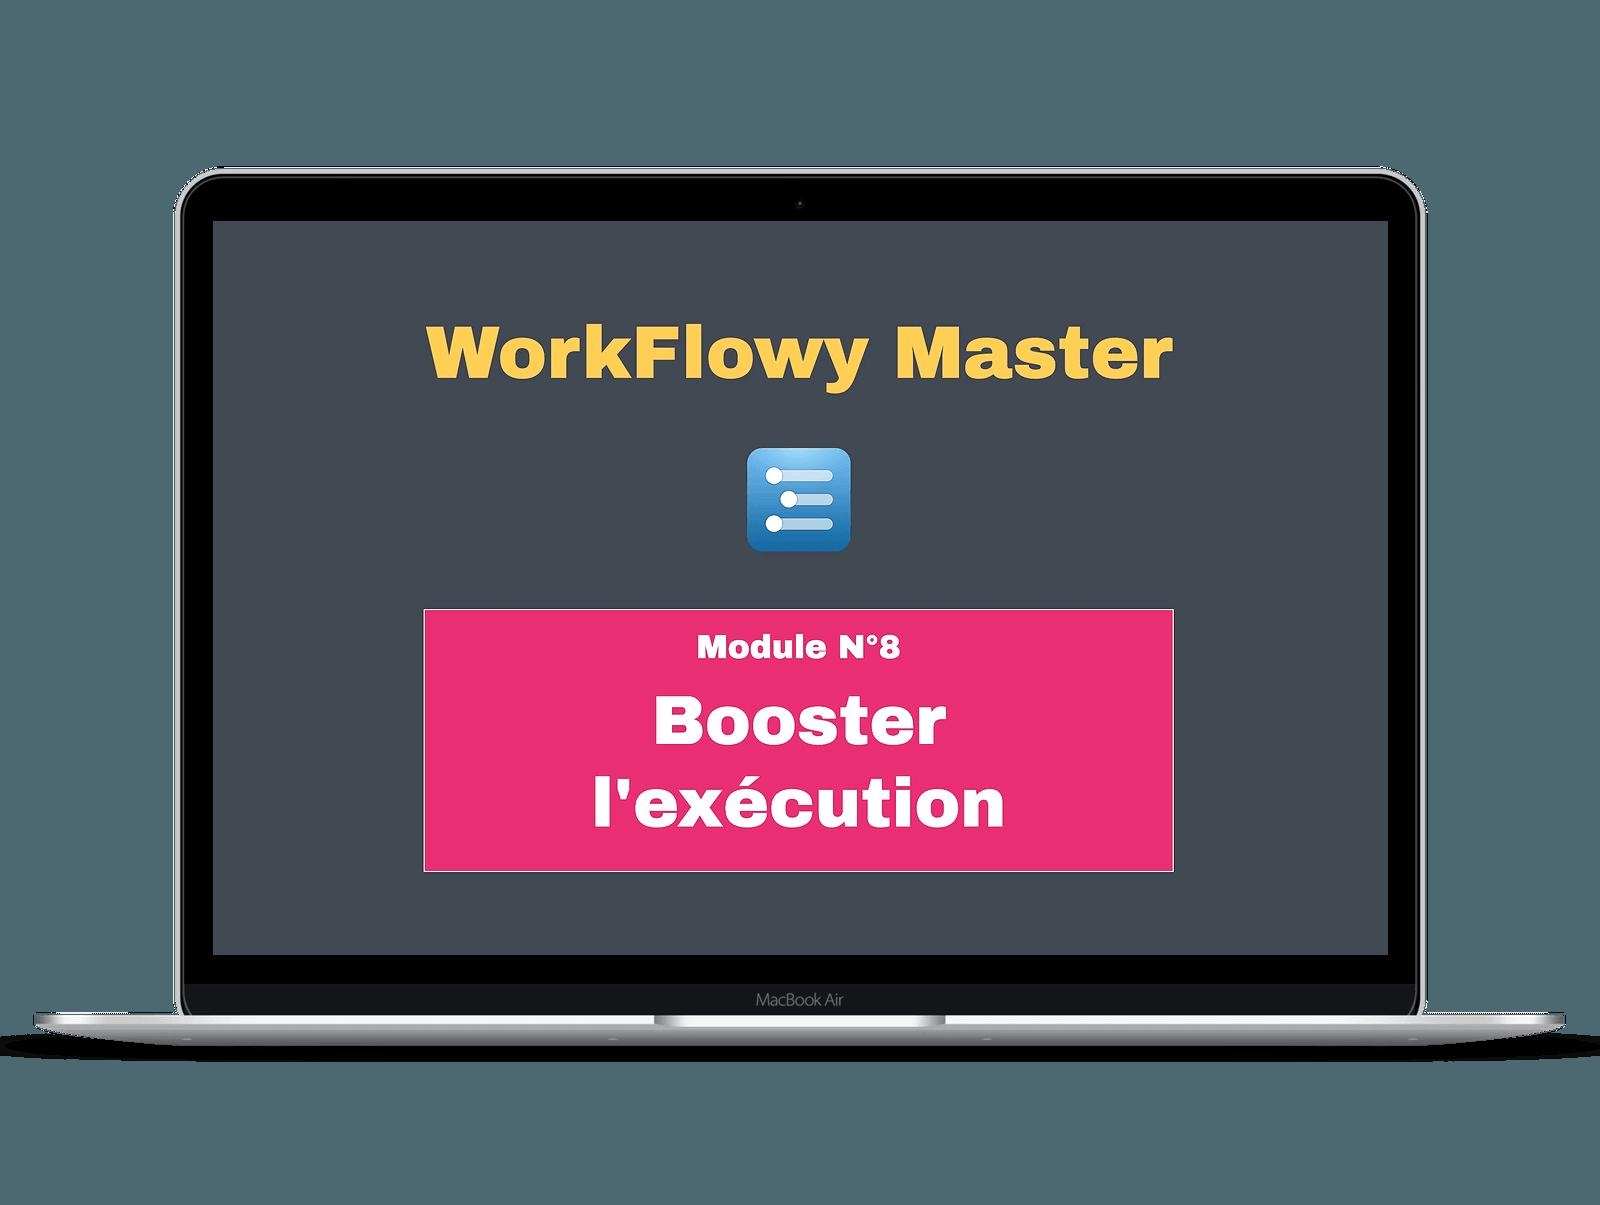 Formation workflowy